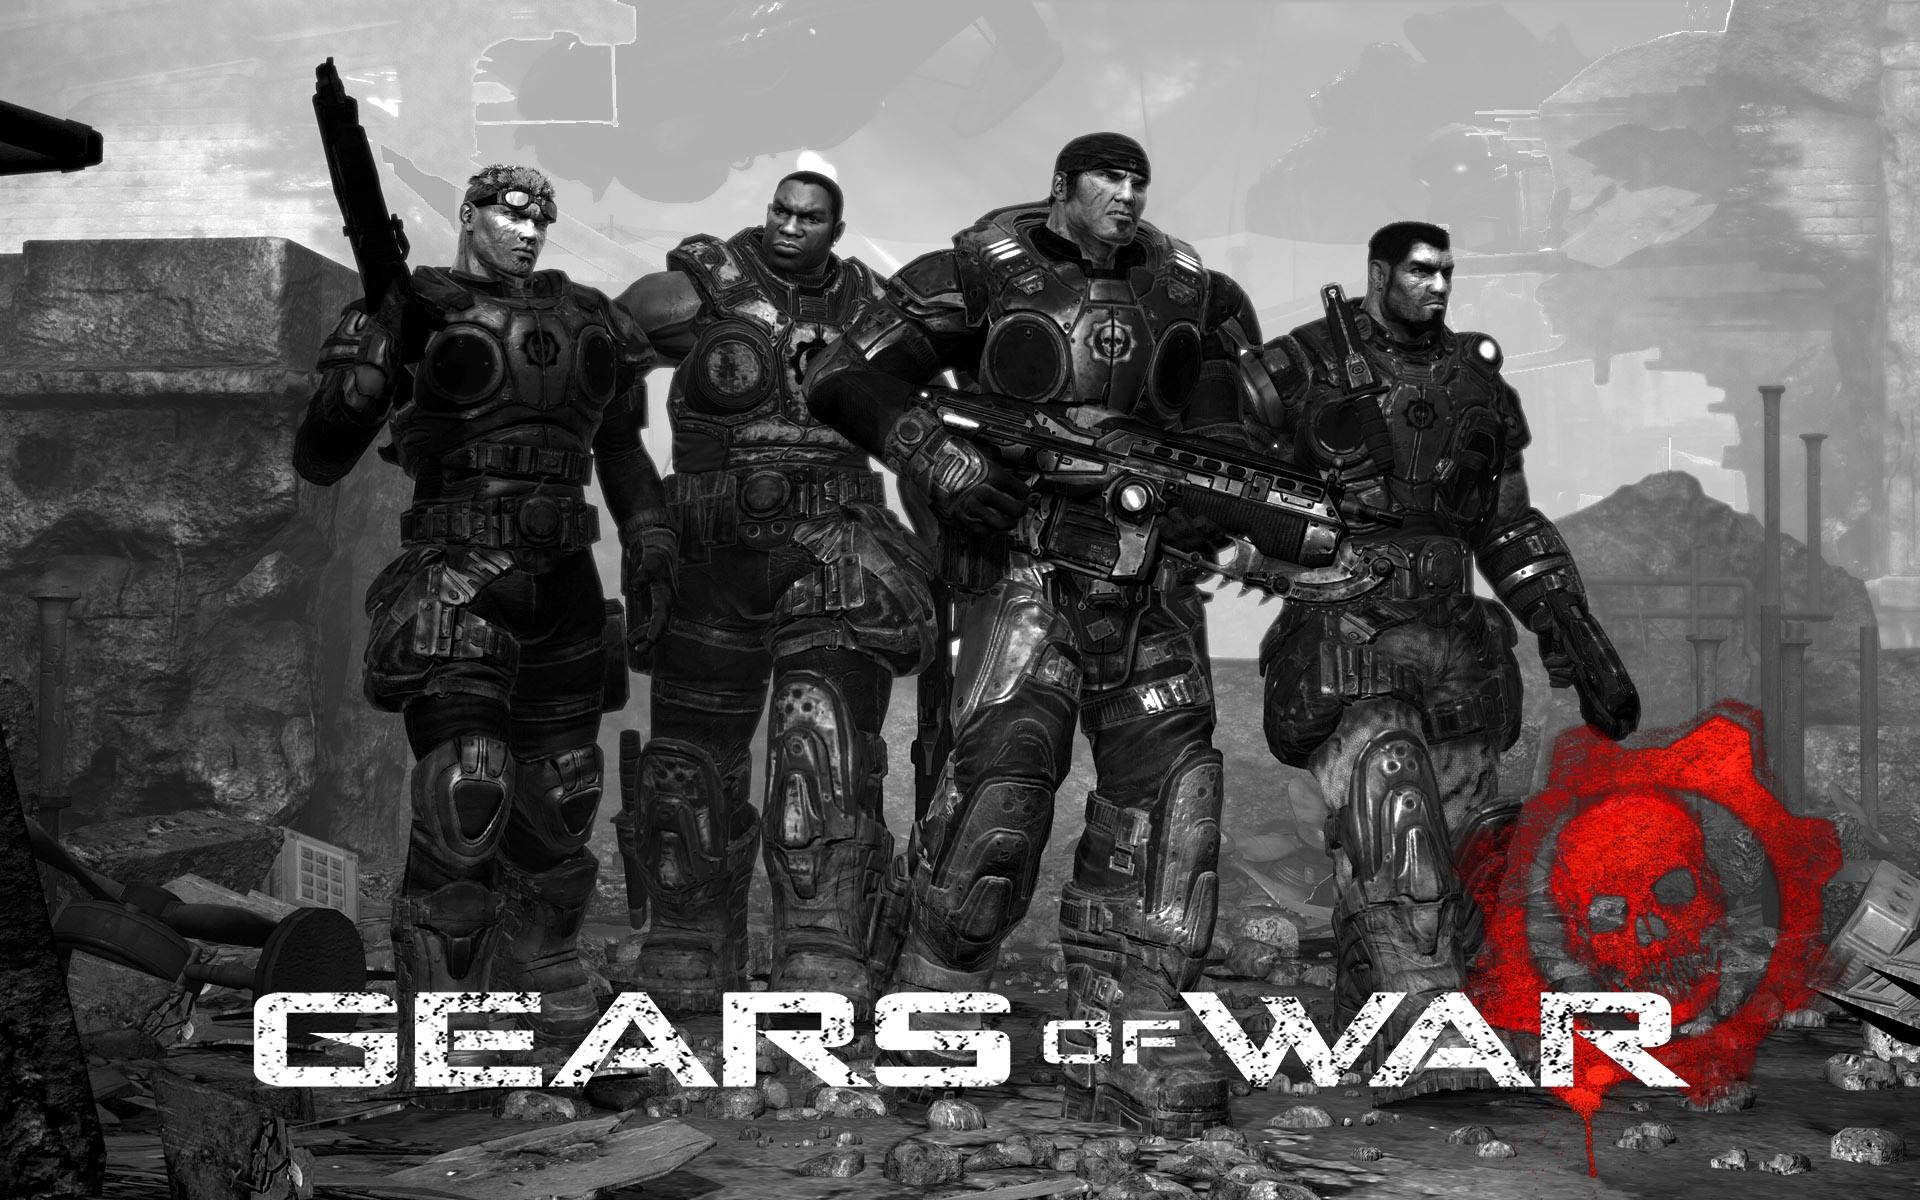 Gears Of War wallpaper   29658 1920x1200